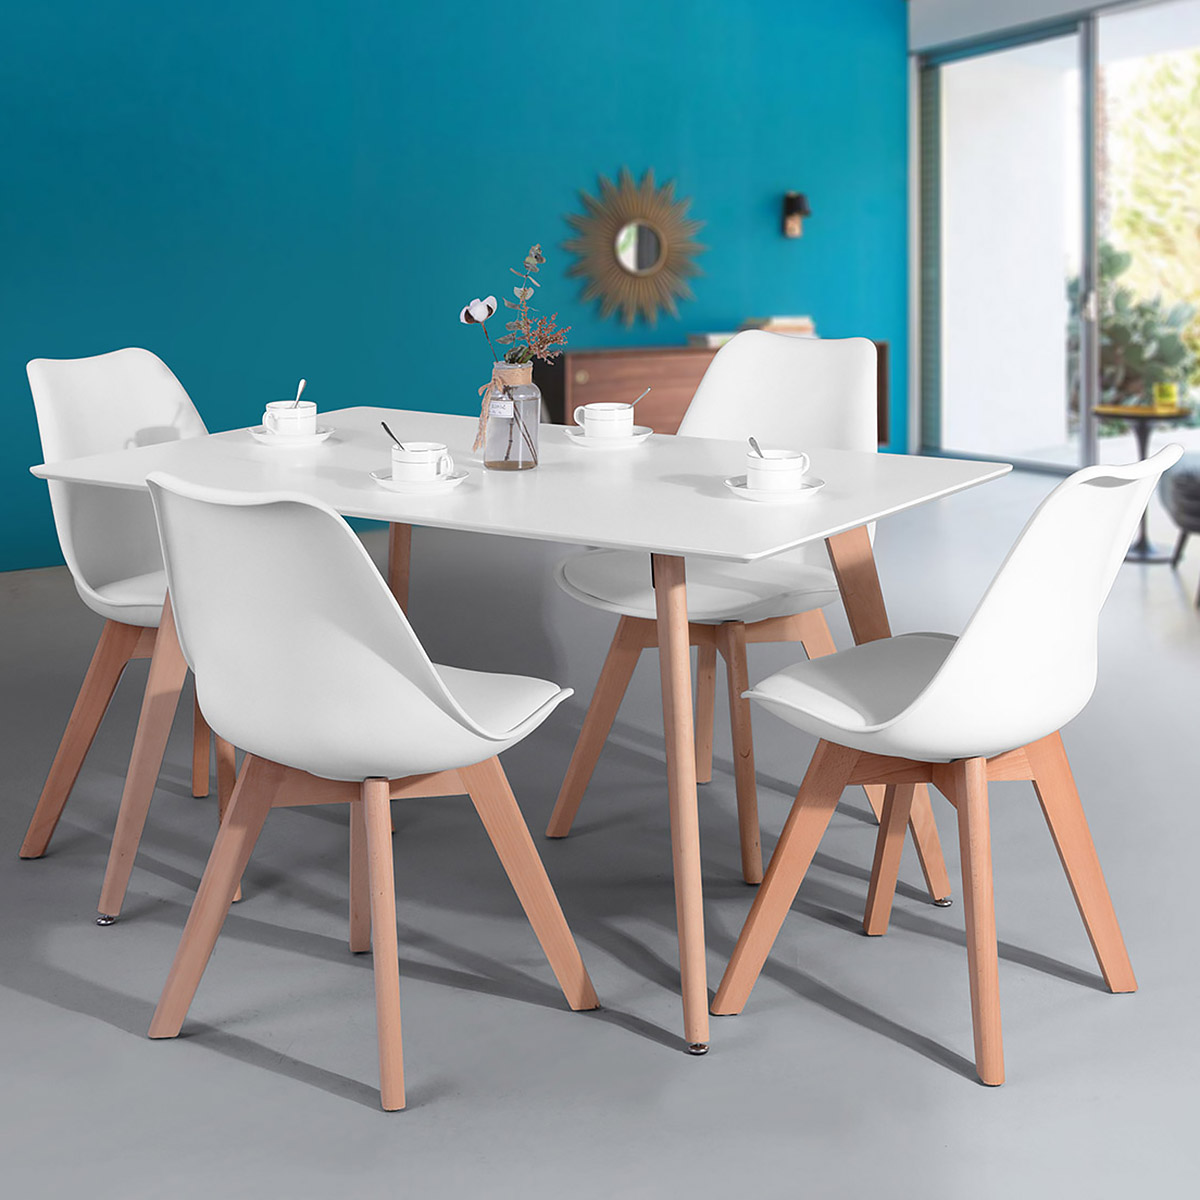 Geniqua Wooden Oak White Dining Table Contemporary Kitchen Room Furniture Beech Wood Leg Walmart Com Walmart Com